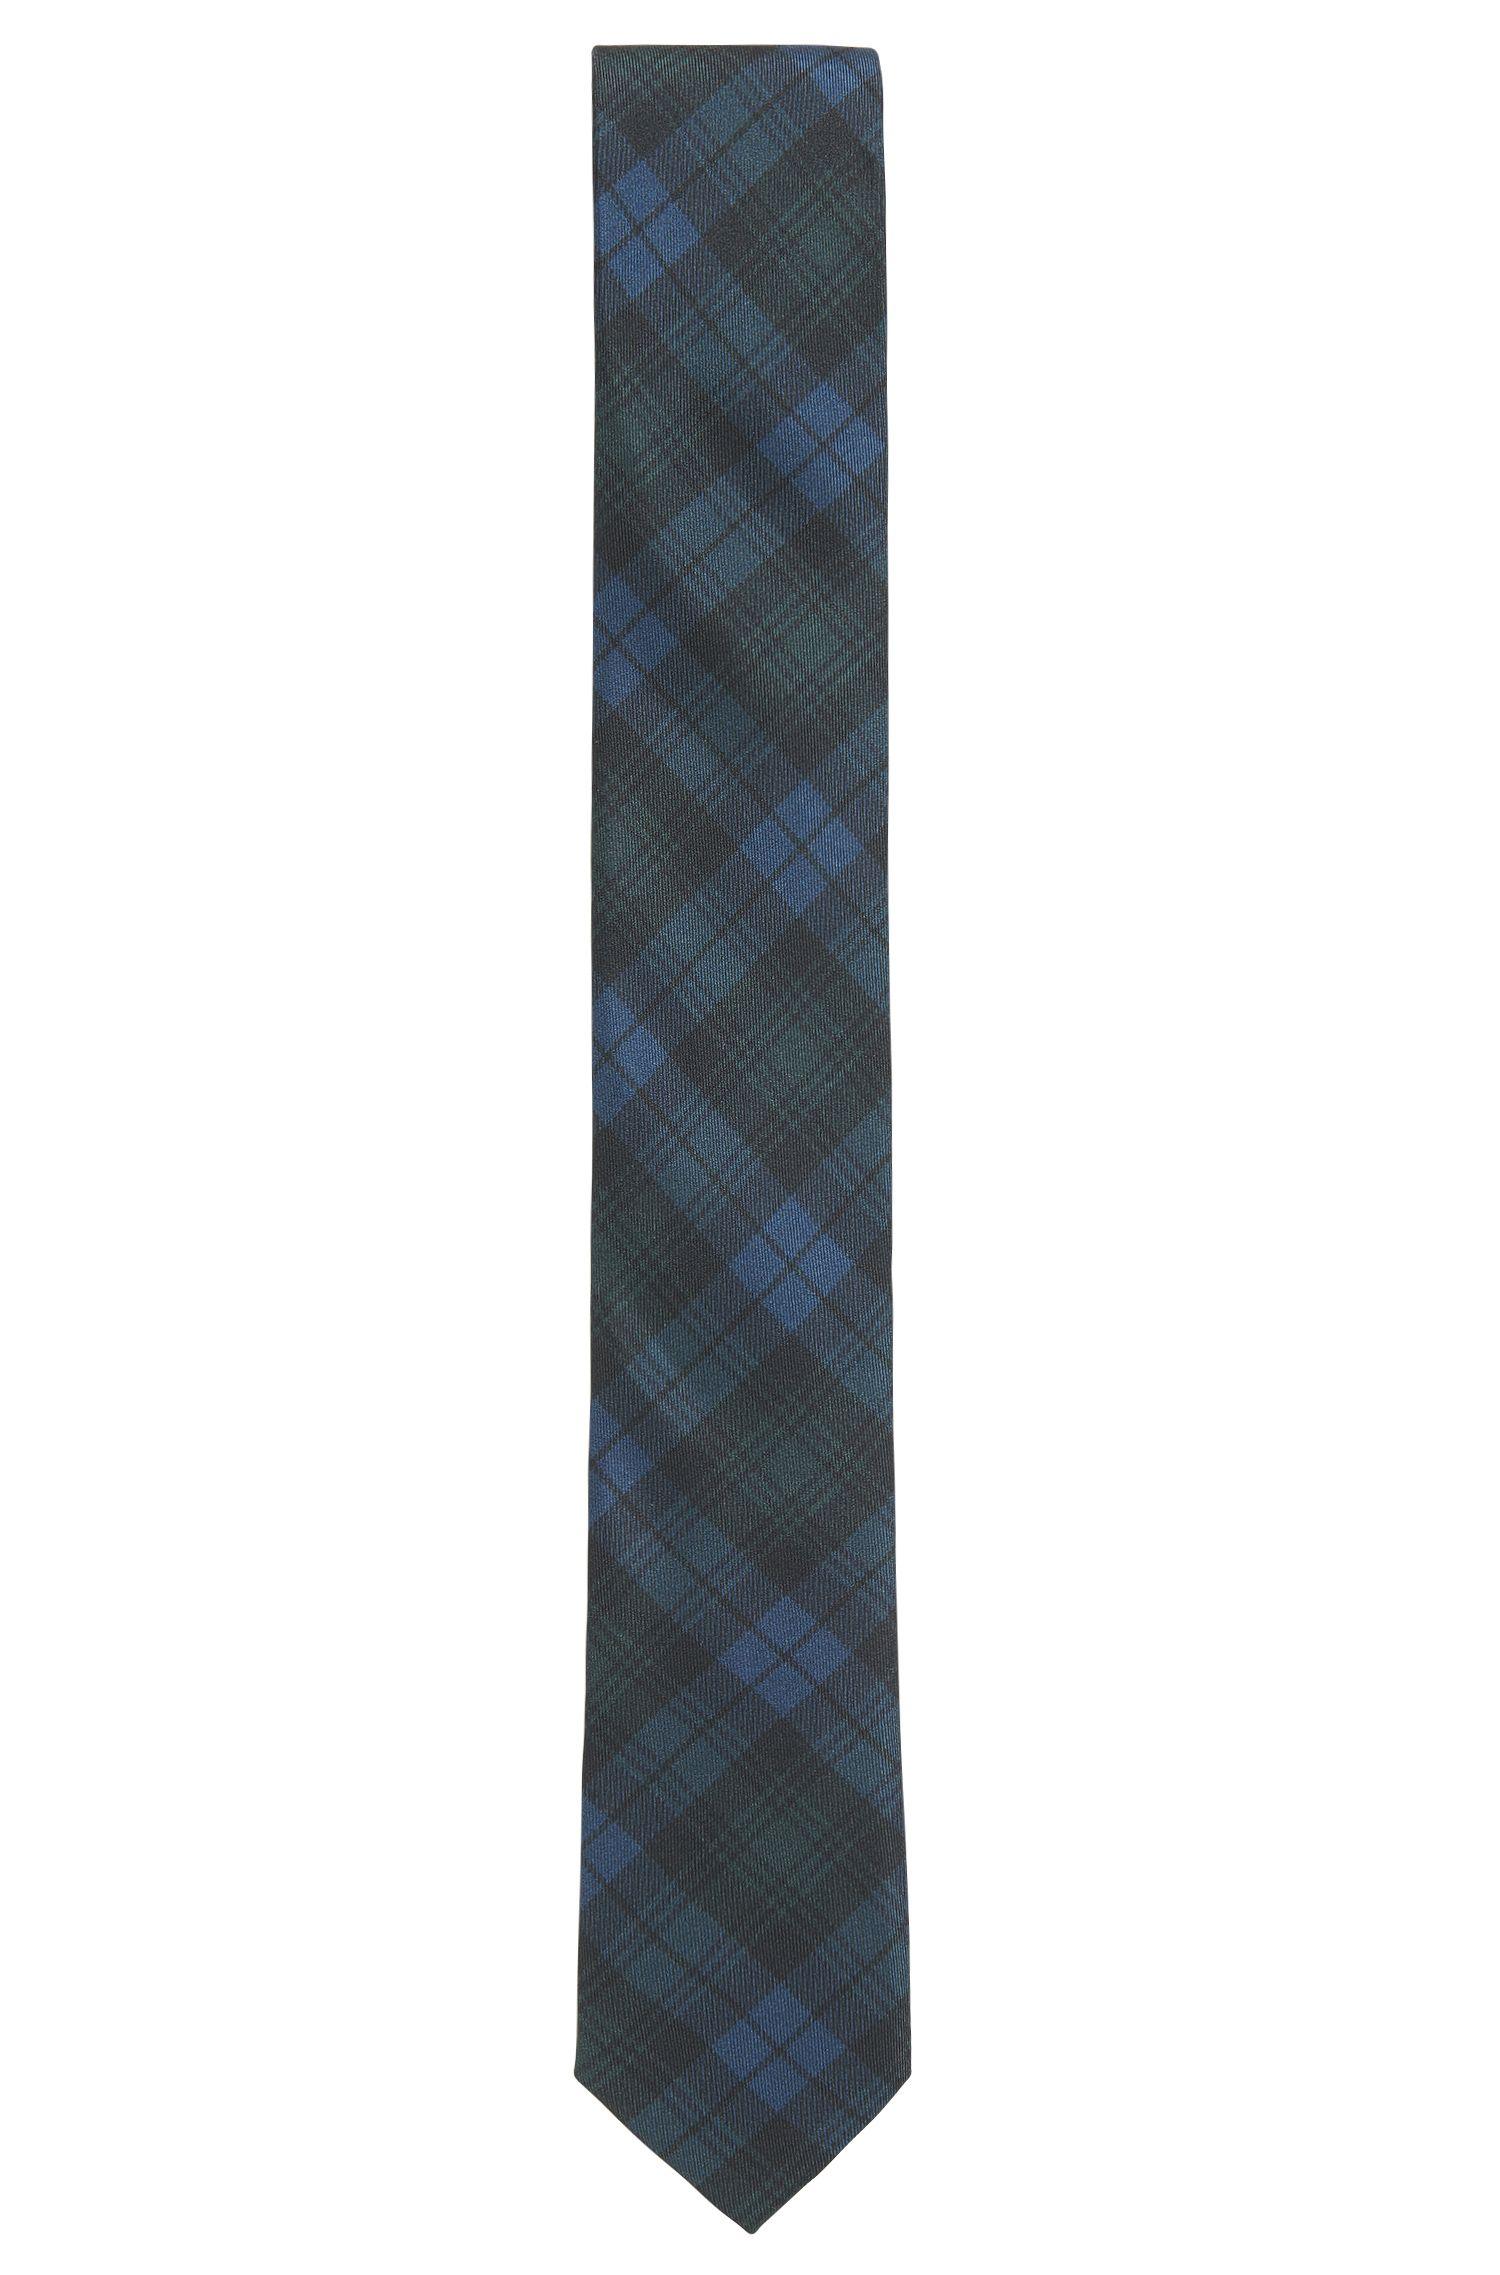 Black Watch Plaid Italian Silk Slim Tie, Open Green